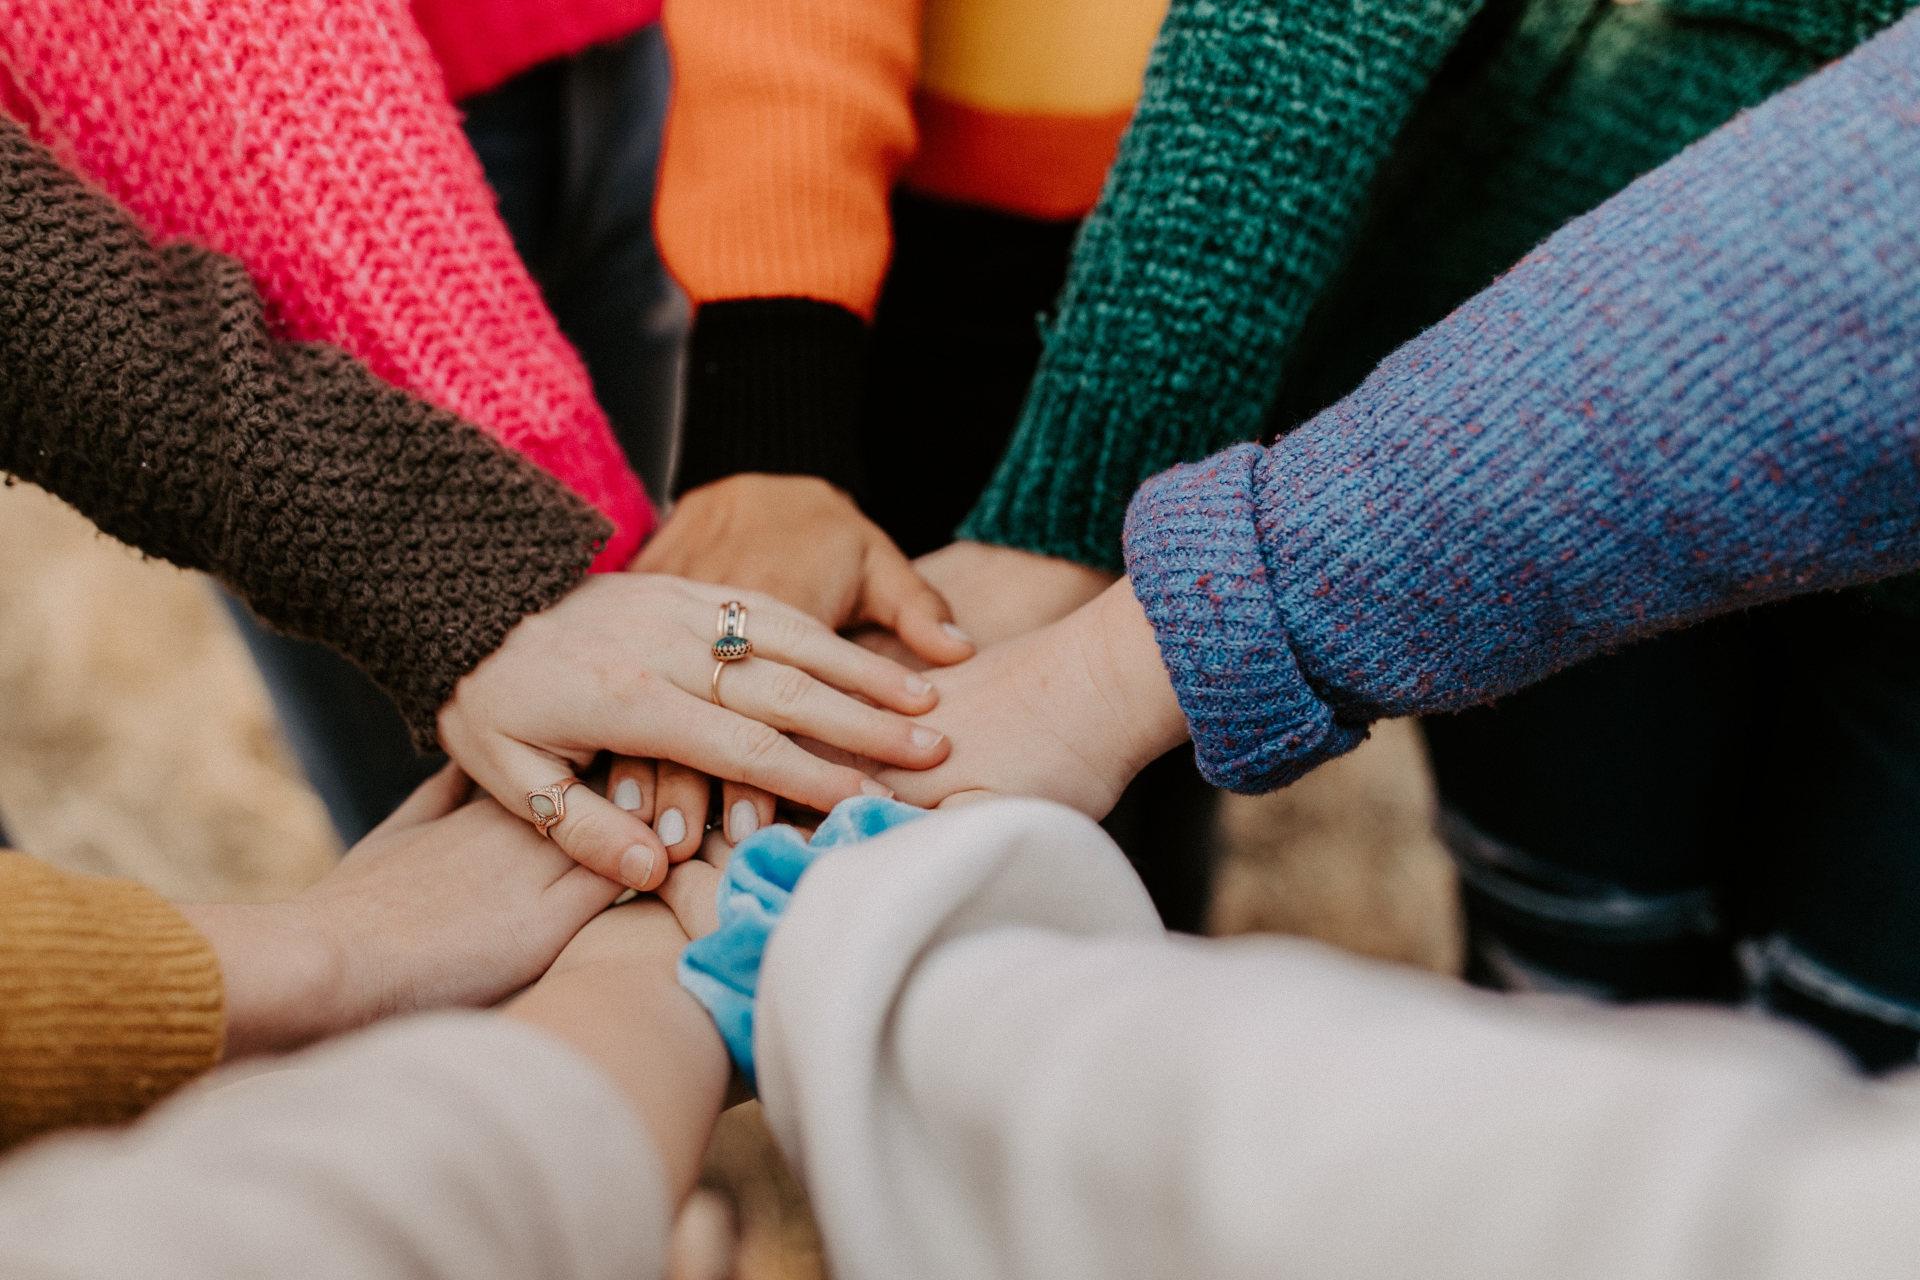 laboratorio ods voluntare voluntariado corporativo agenda 2030